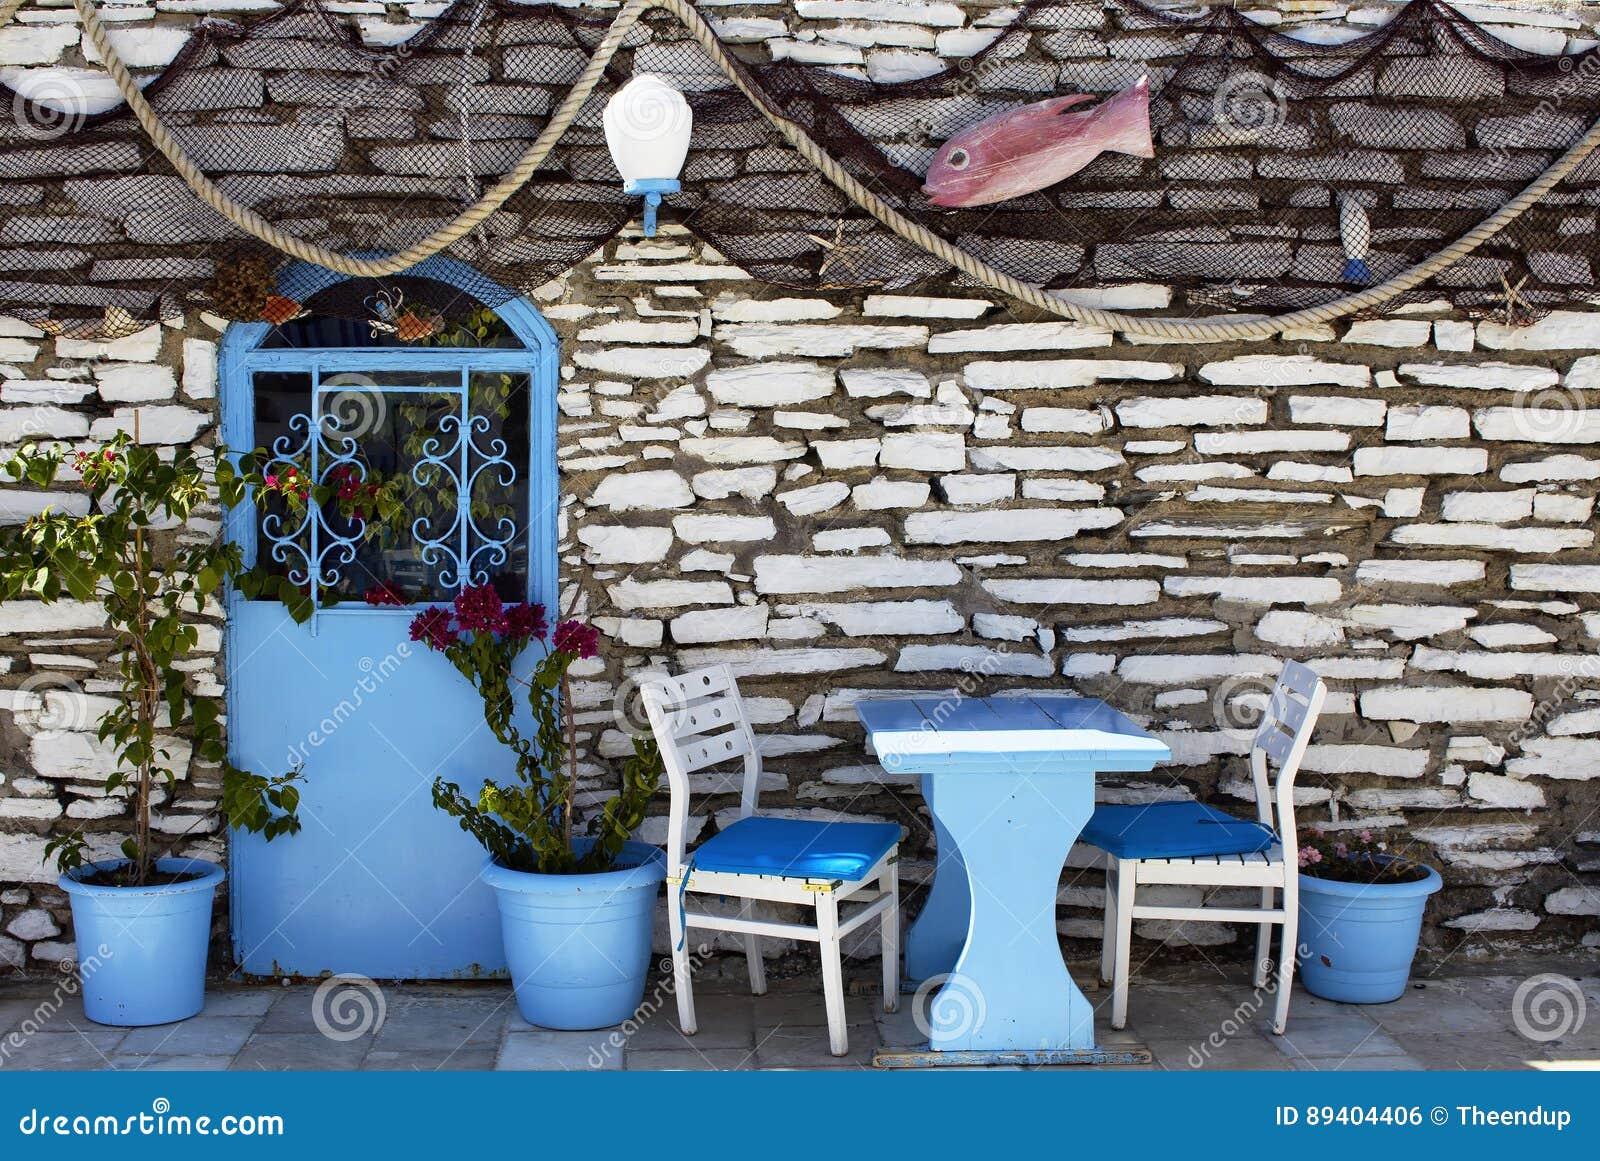 Vista de redes dos peixes, de cadeiras azuis, de porta, de potenciômetros e da parede de pedra